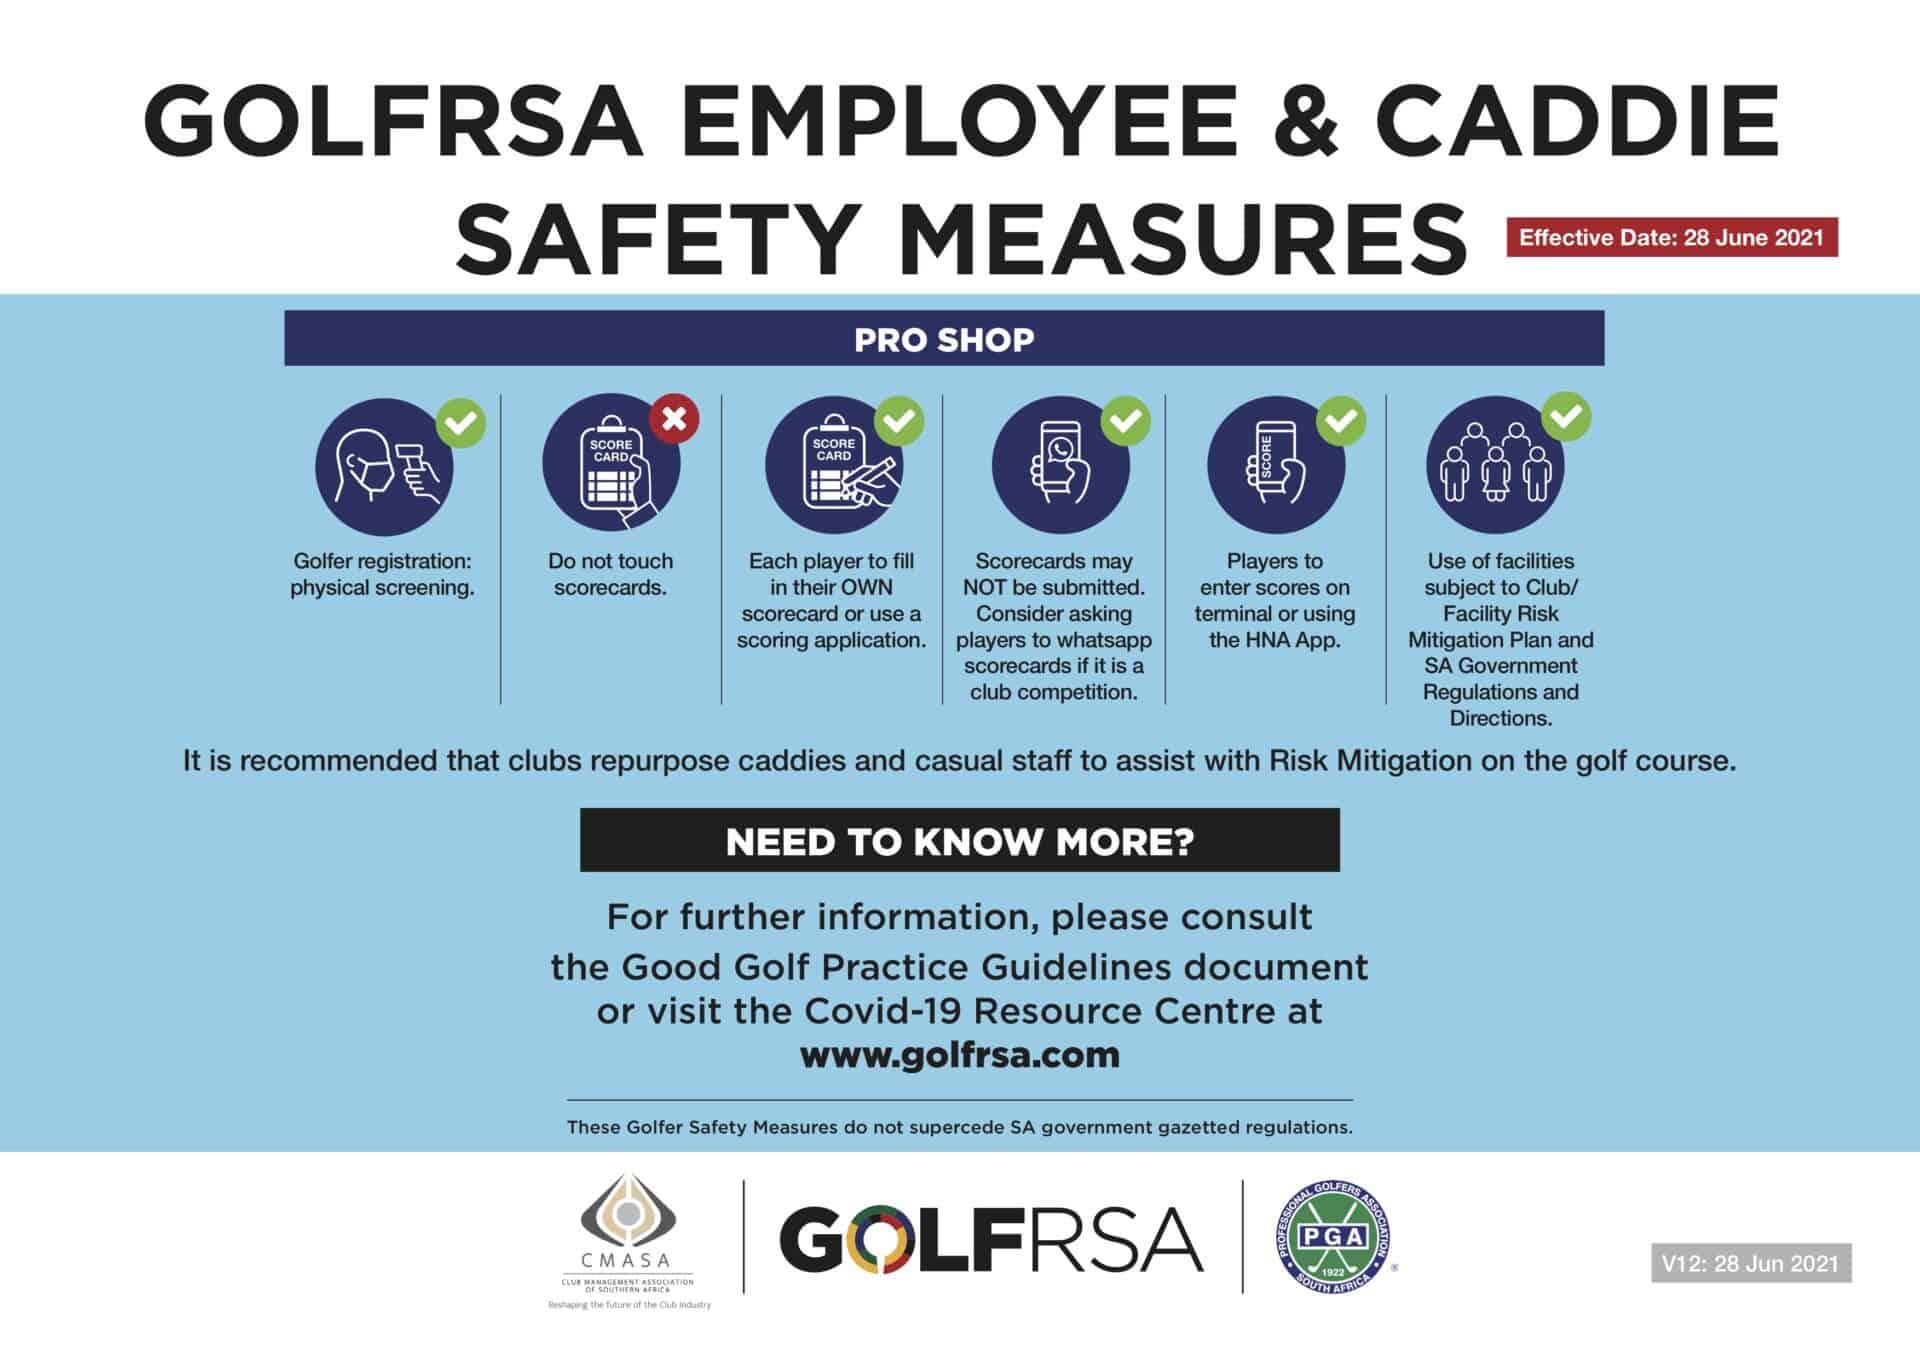 2 - ENG GolfRSA caddie and employee safety measures V12 - Jun 2021